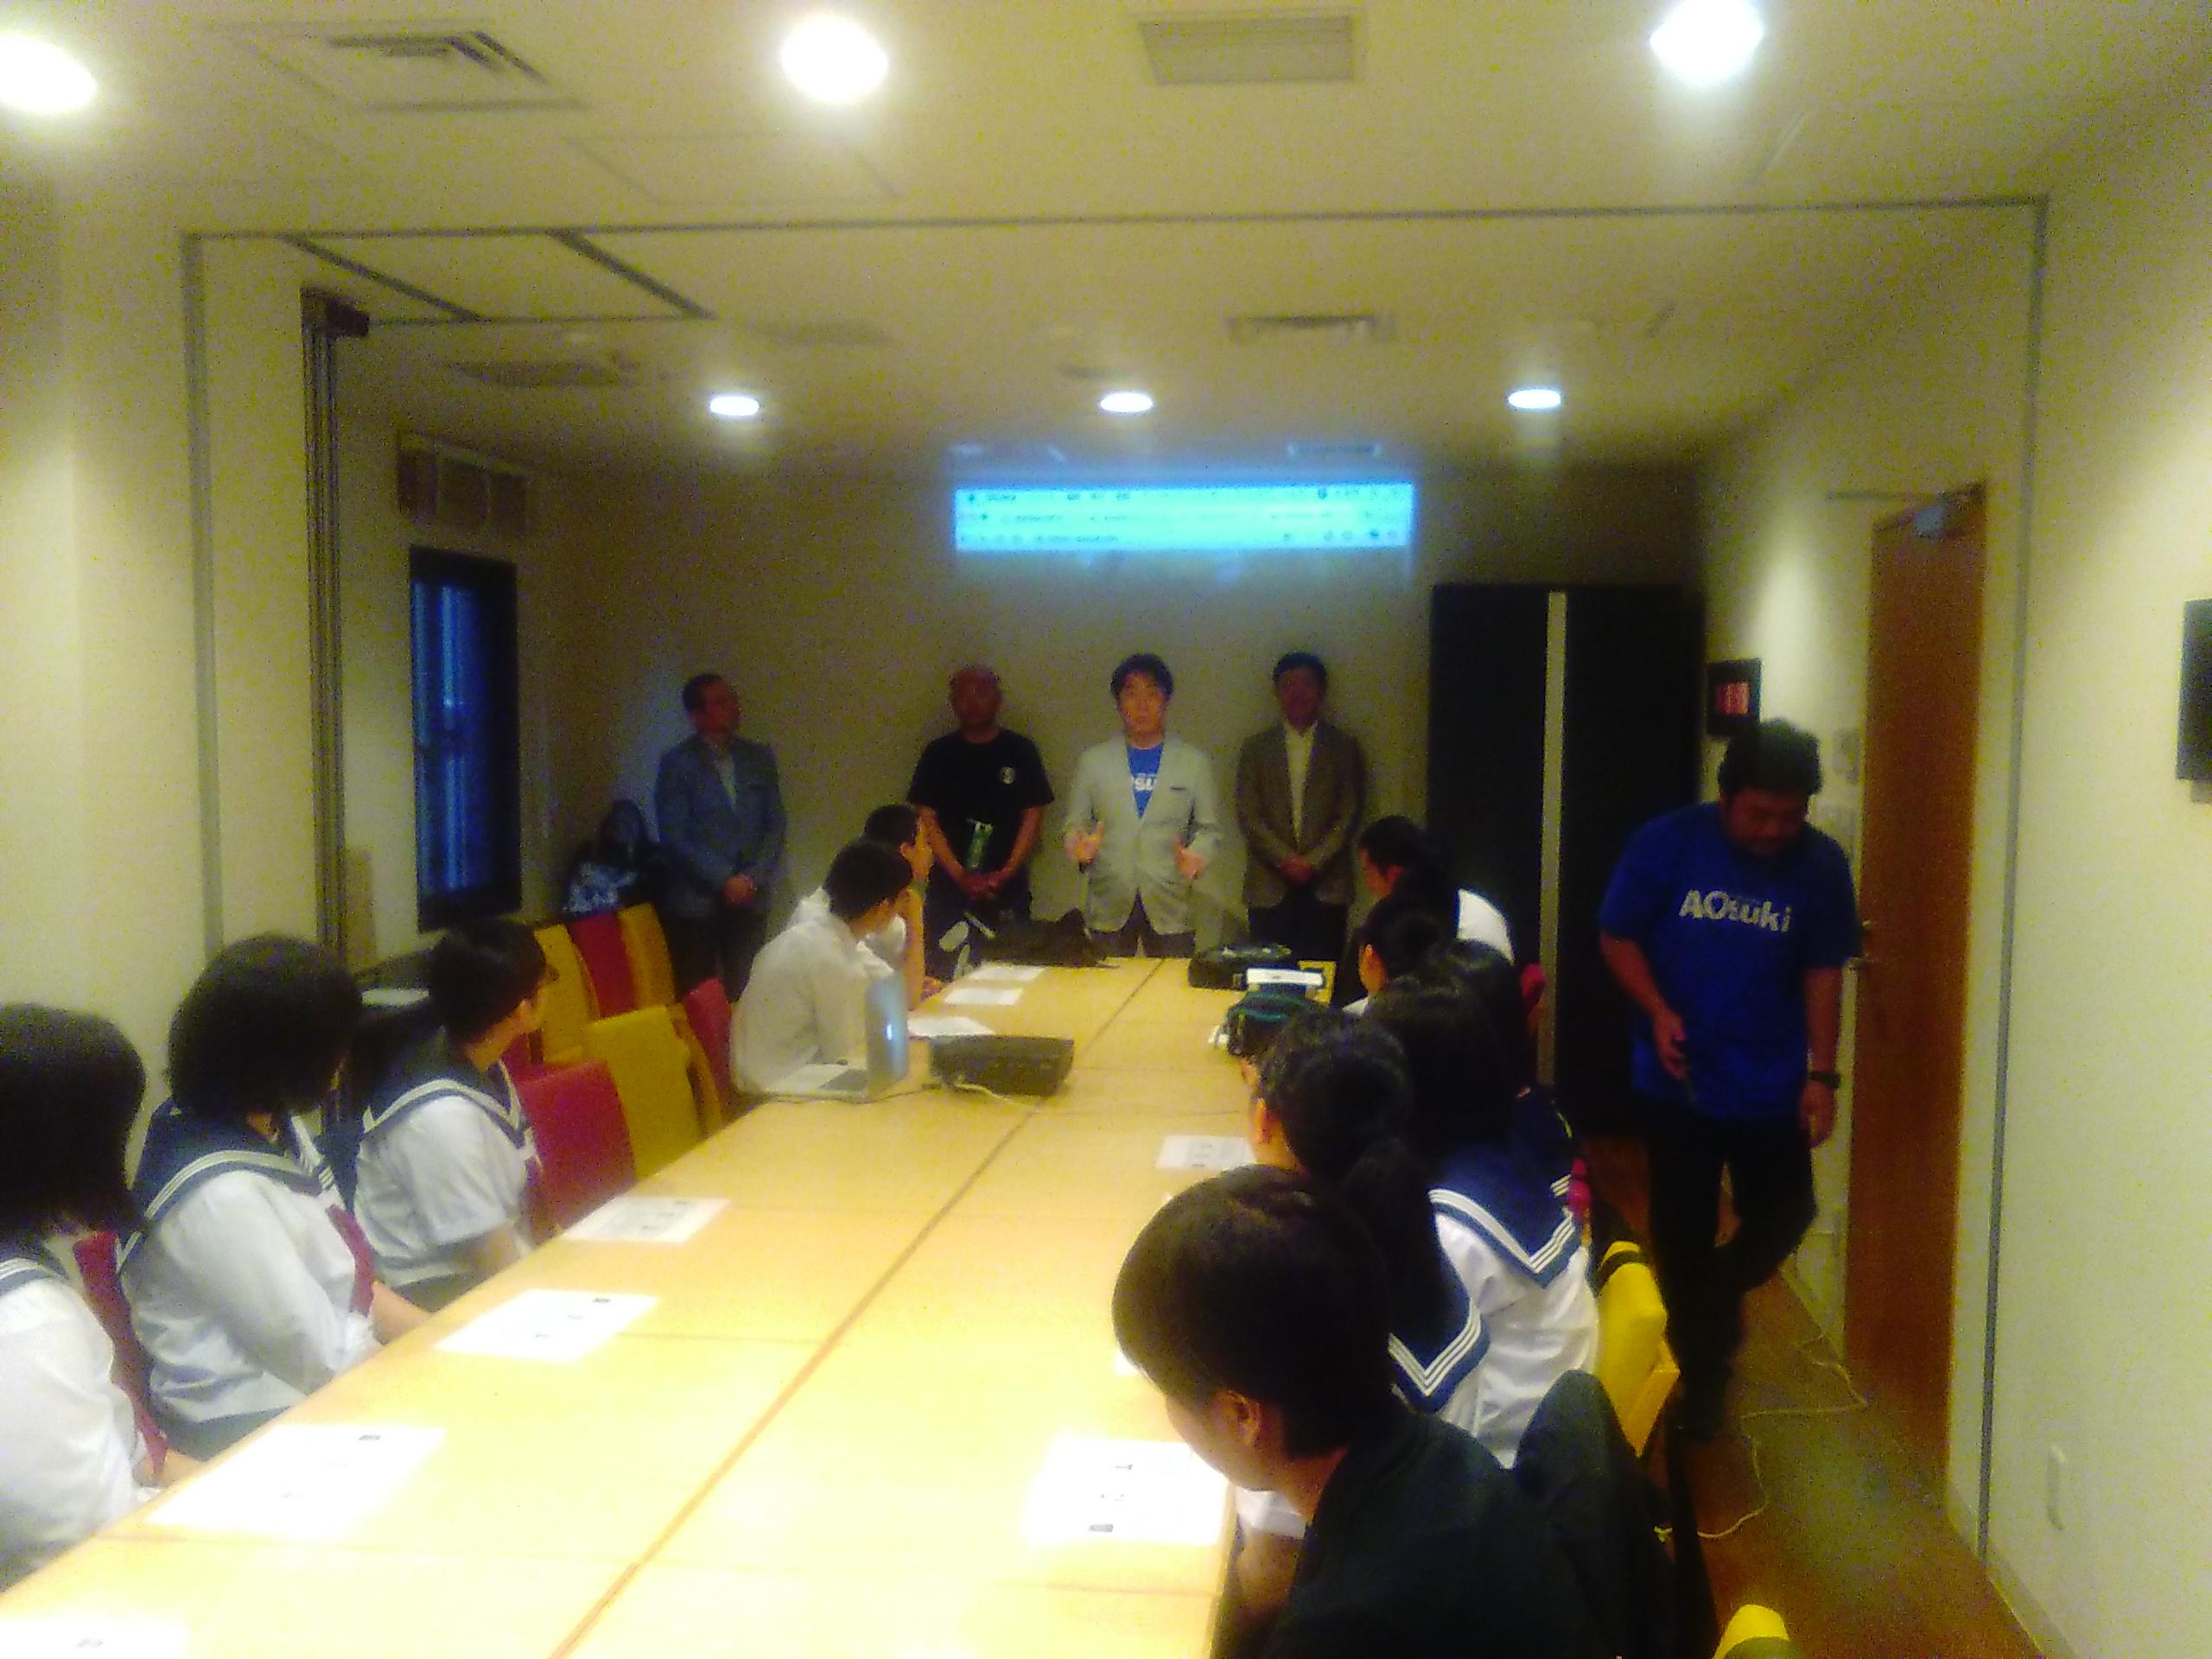 KIMG1200 - AFS【アオスキフューチャーズゼミ】 西平内中学校